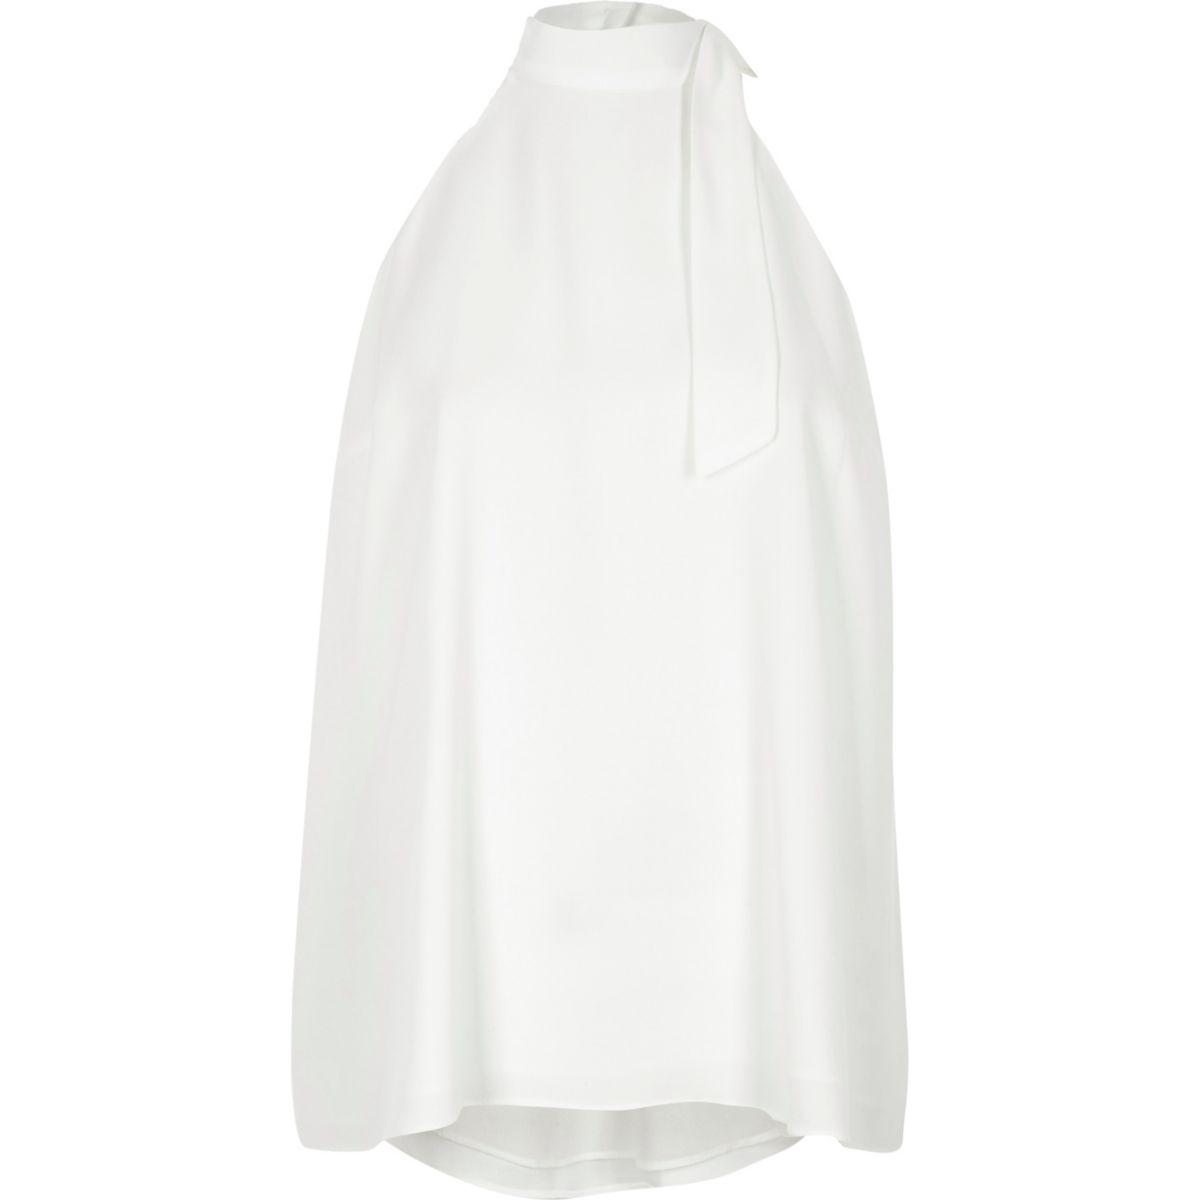 White high tie neck cross back sleeveless top